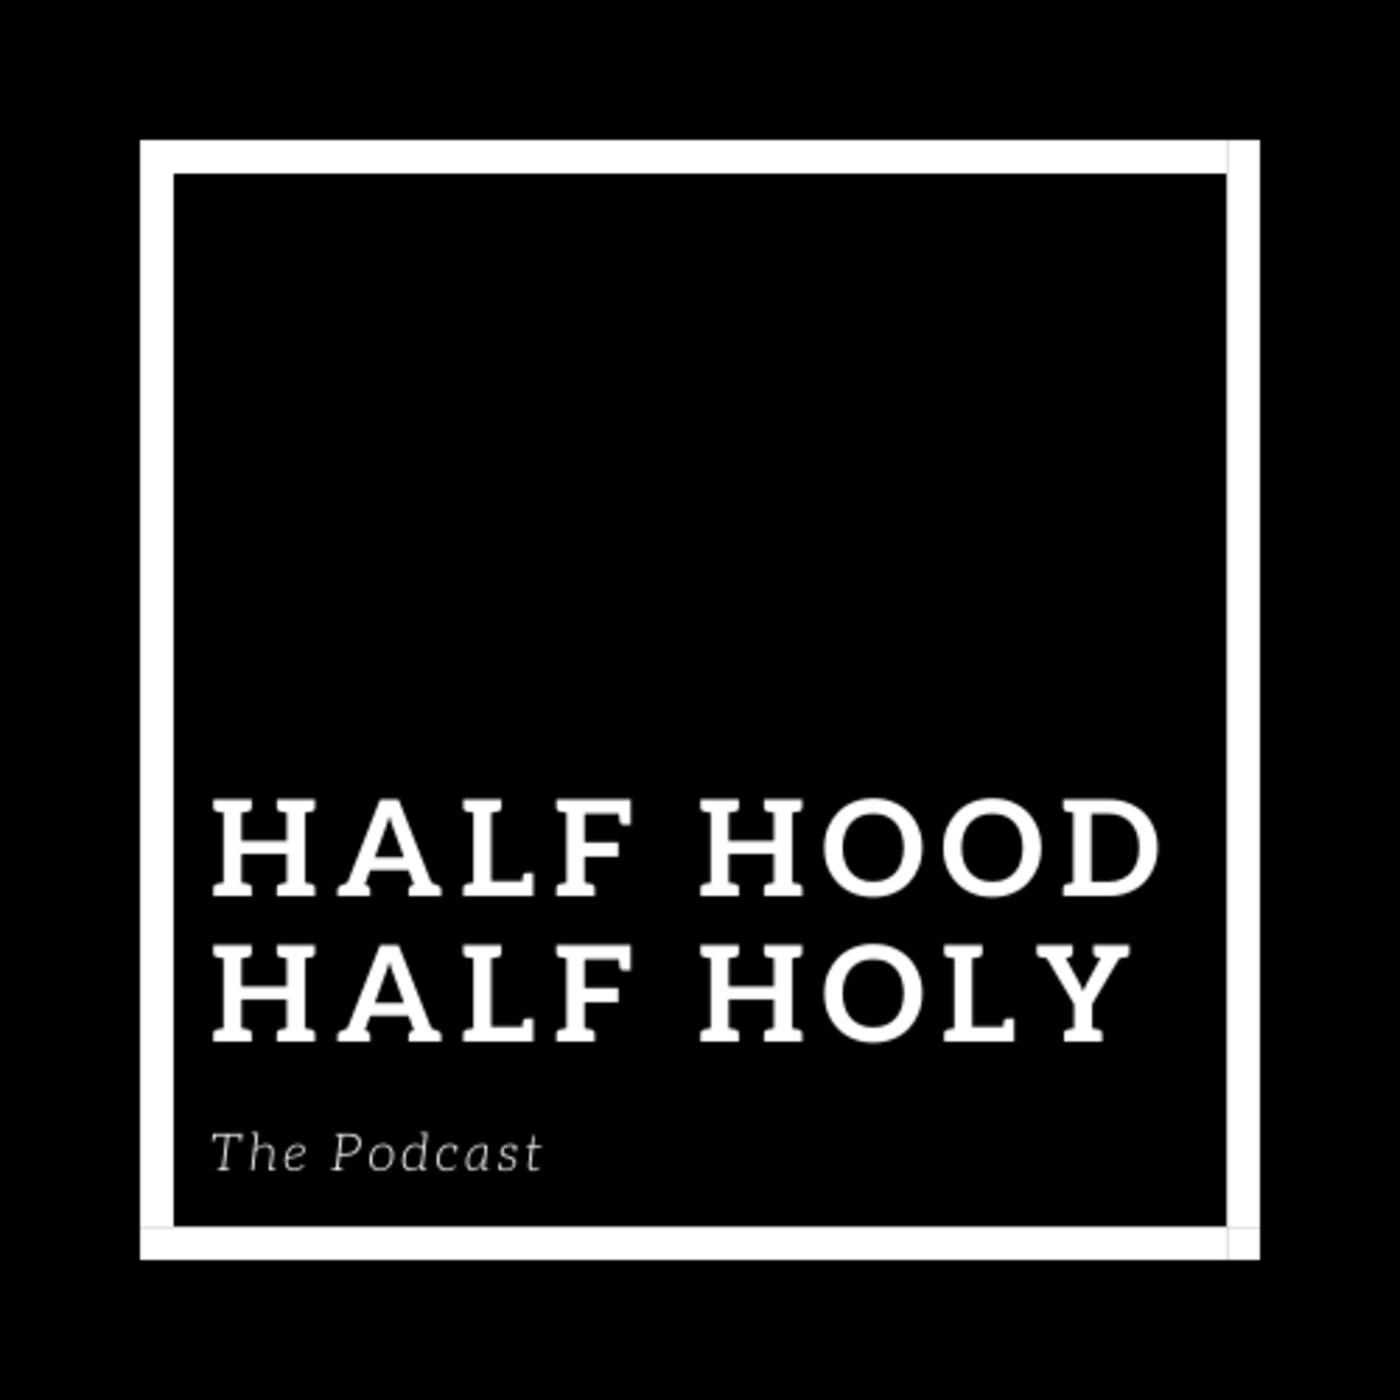 Half Hood Half Holy